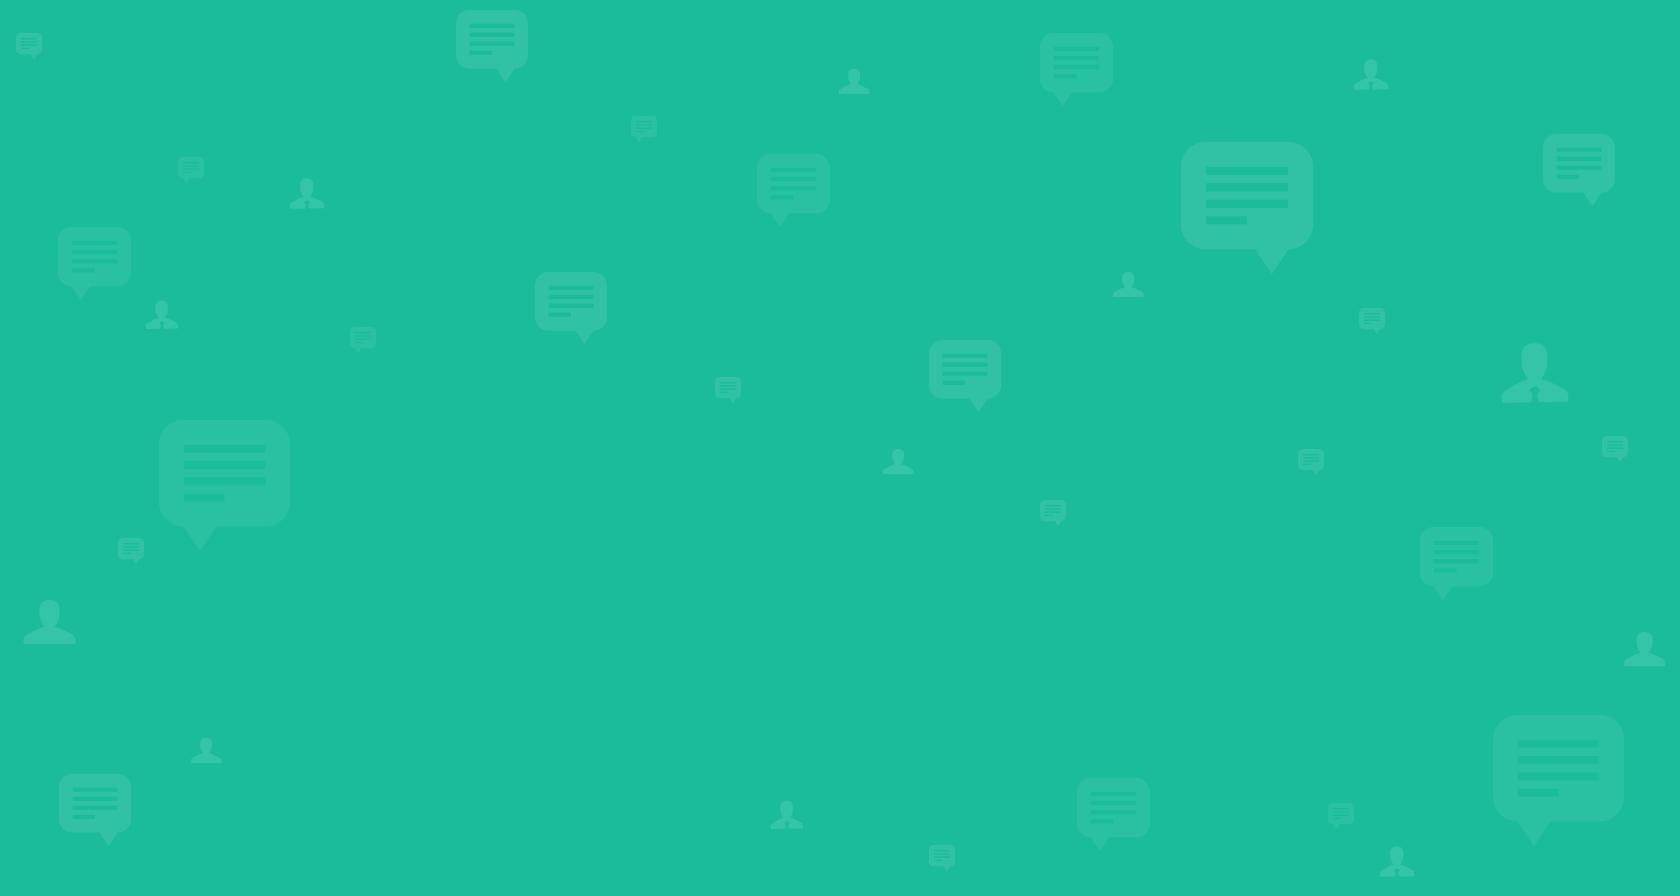 speech_icons